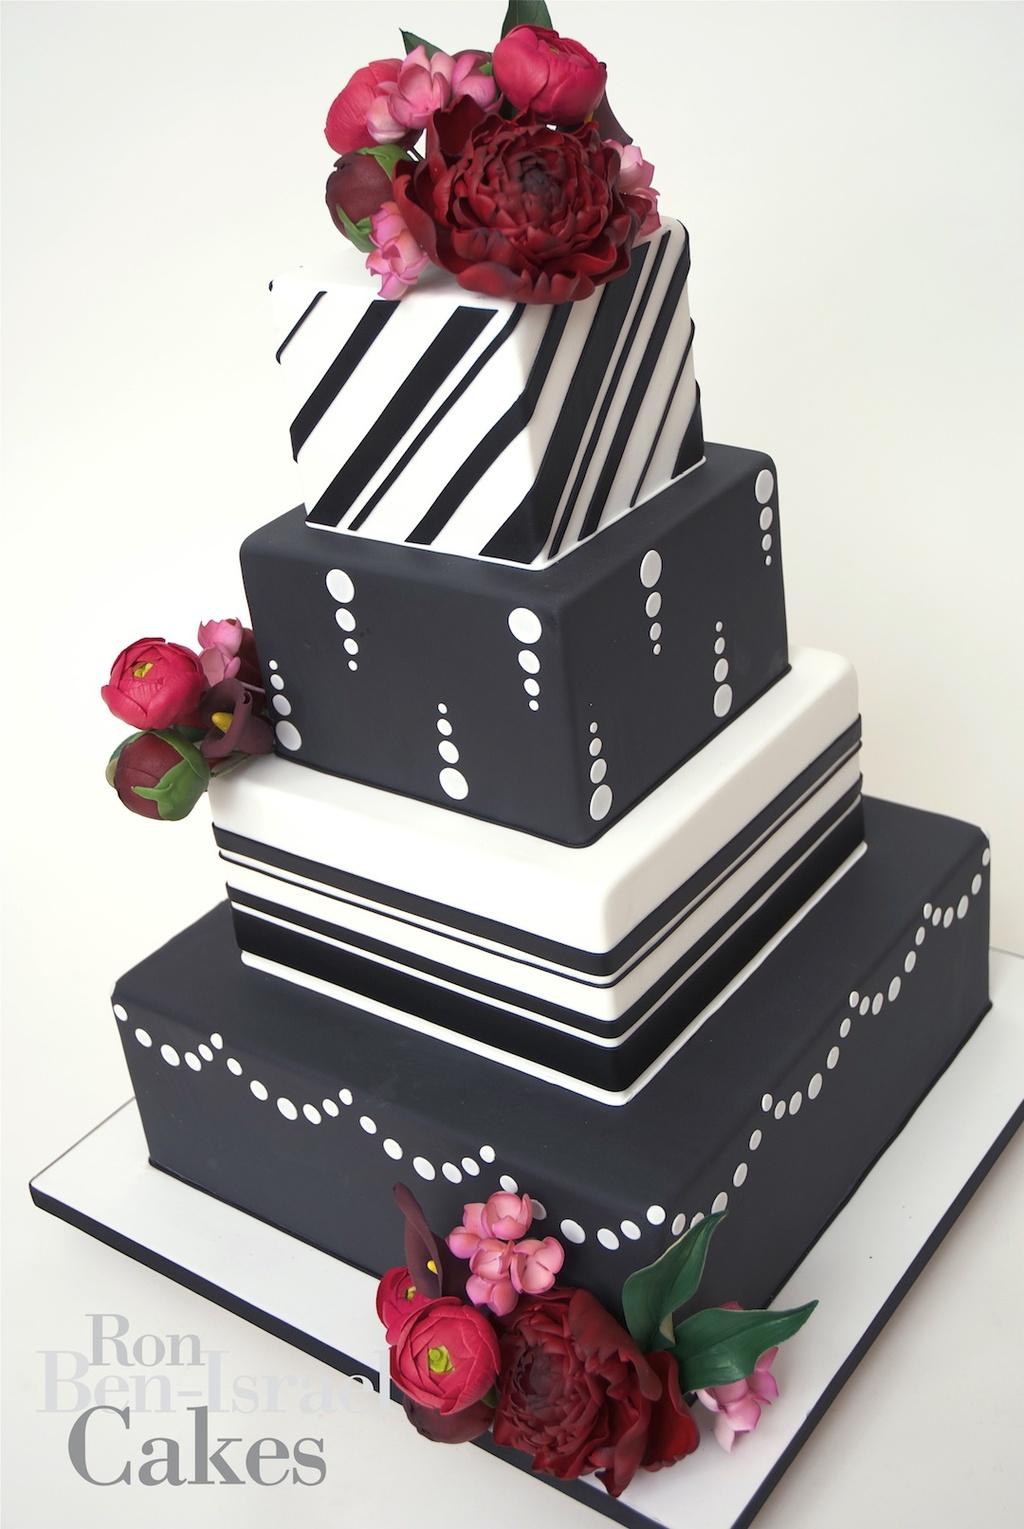 Wedding-cake-inspiration-ron-ben-isreal-wedding-cakes-black-white-red.full